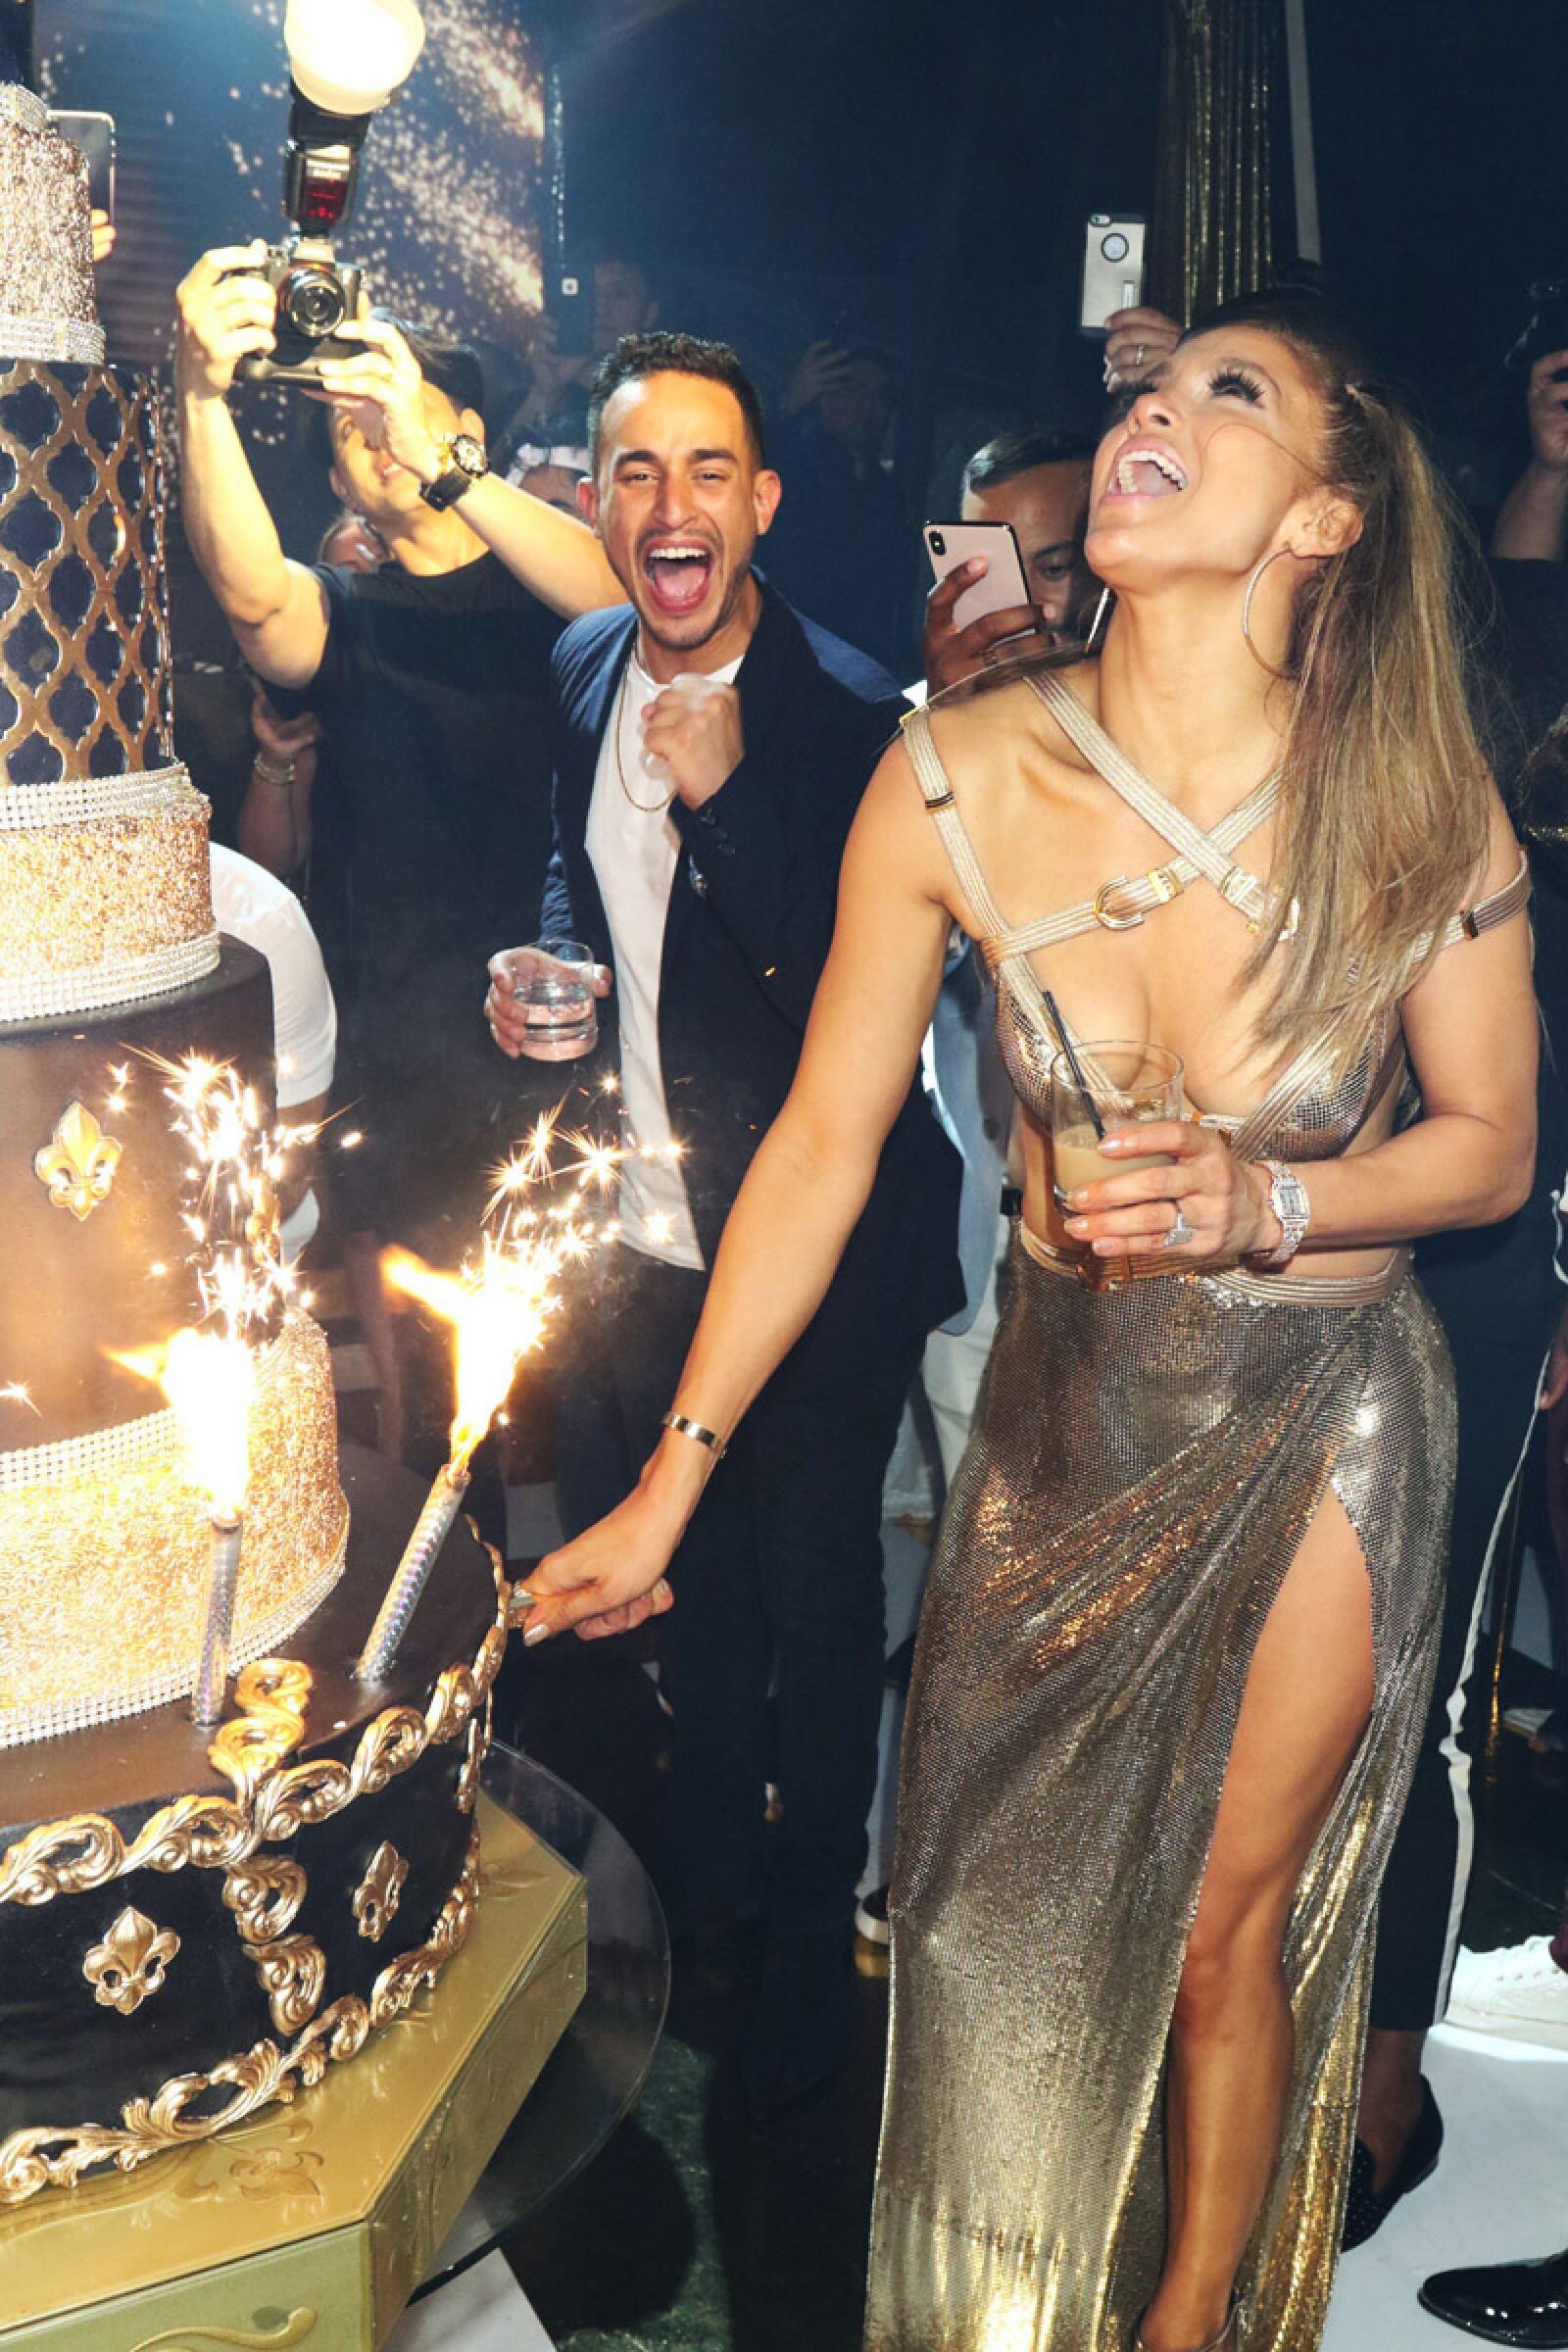 Jennifer Lopez 50th birthday celebration, Miami, Florida - 24 Jul 2019